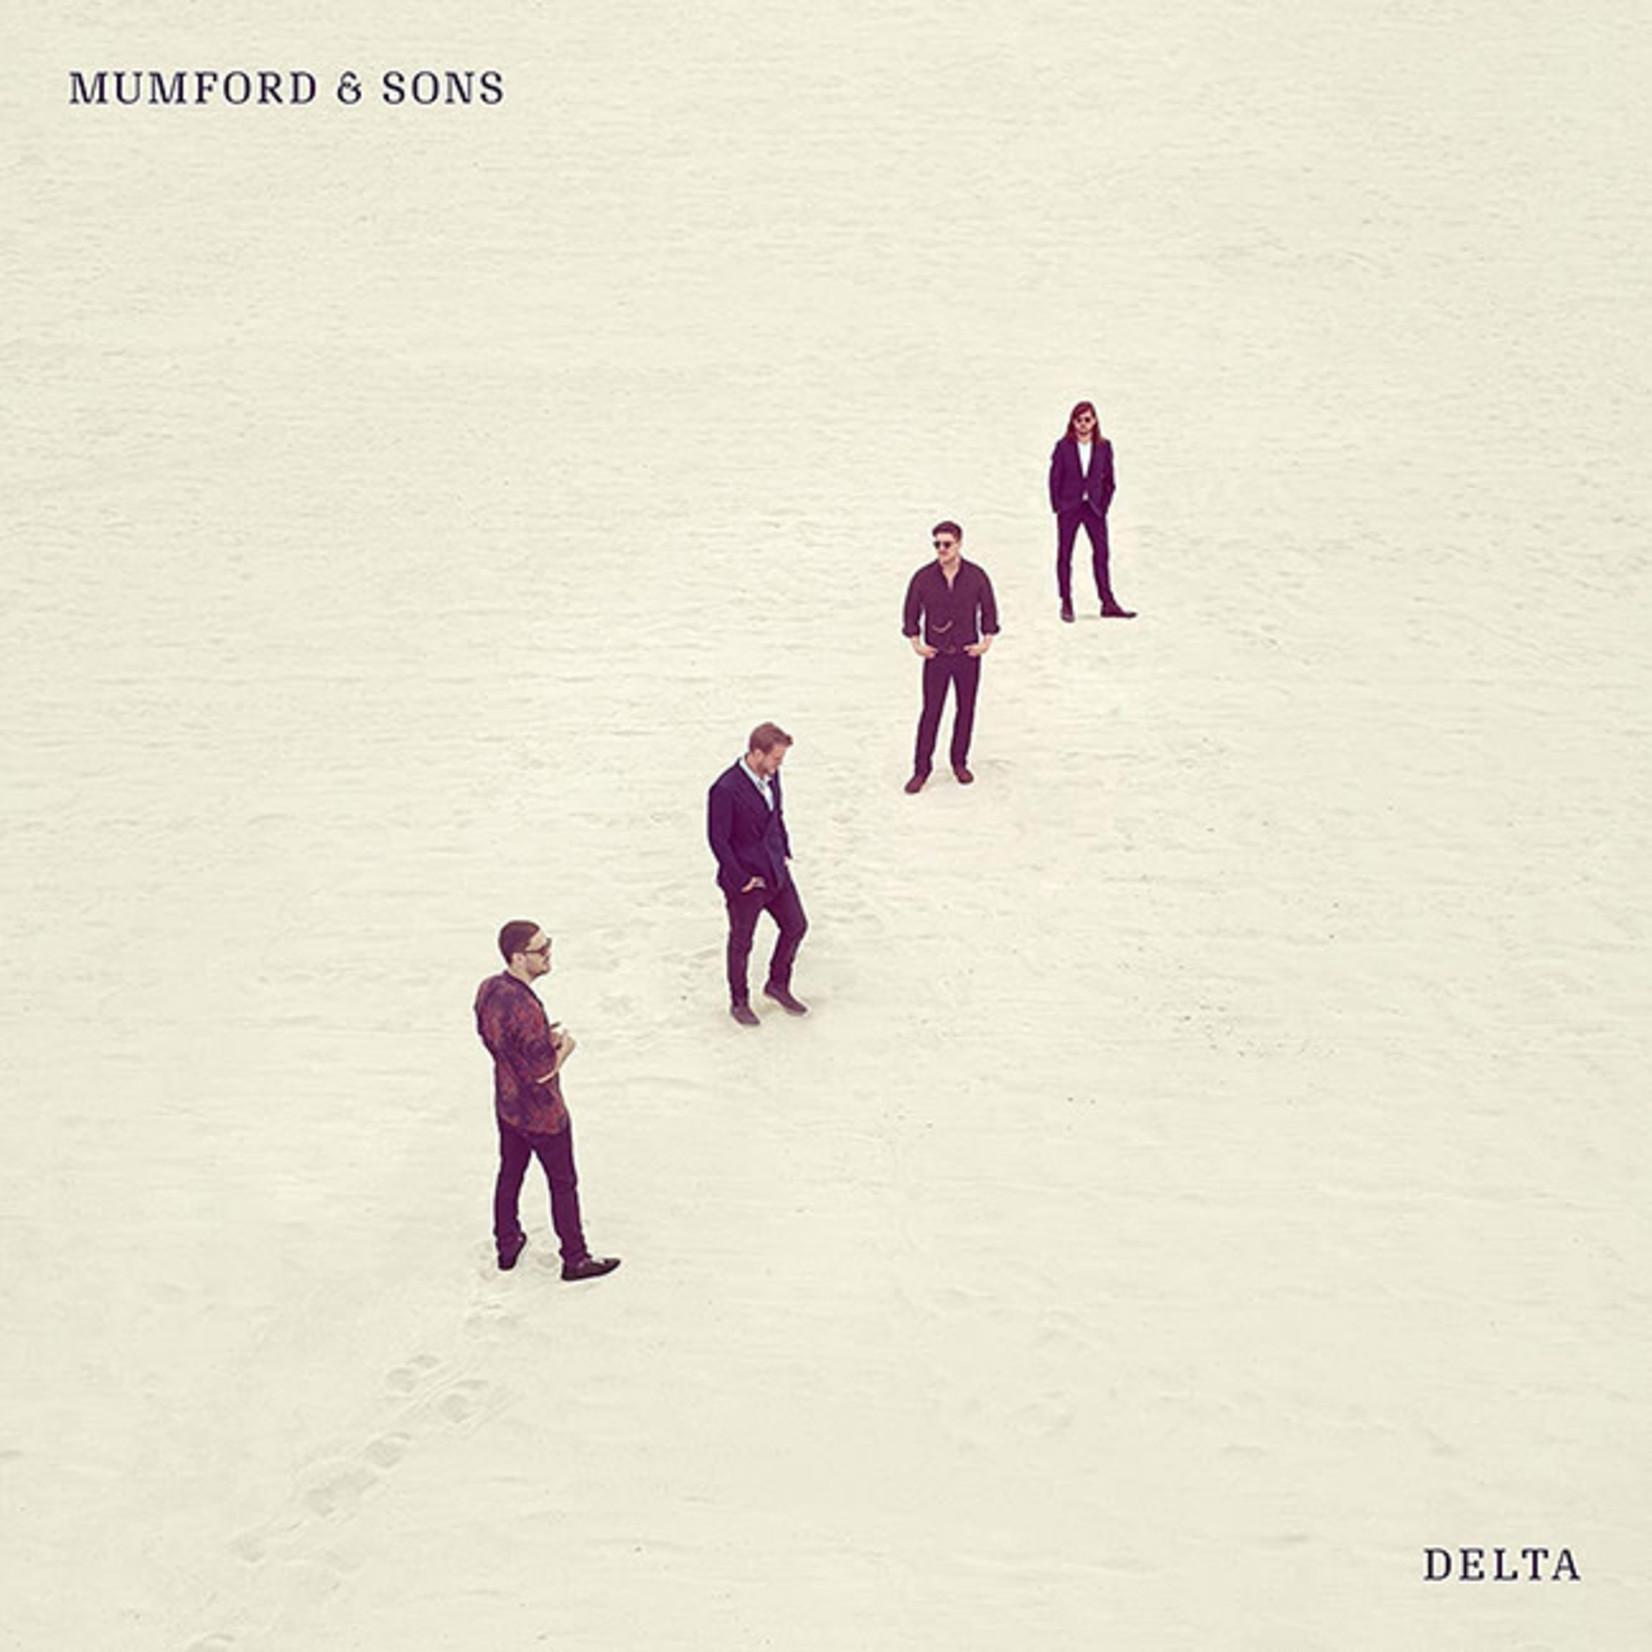 [New] Mumford & Sons: Delta